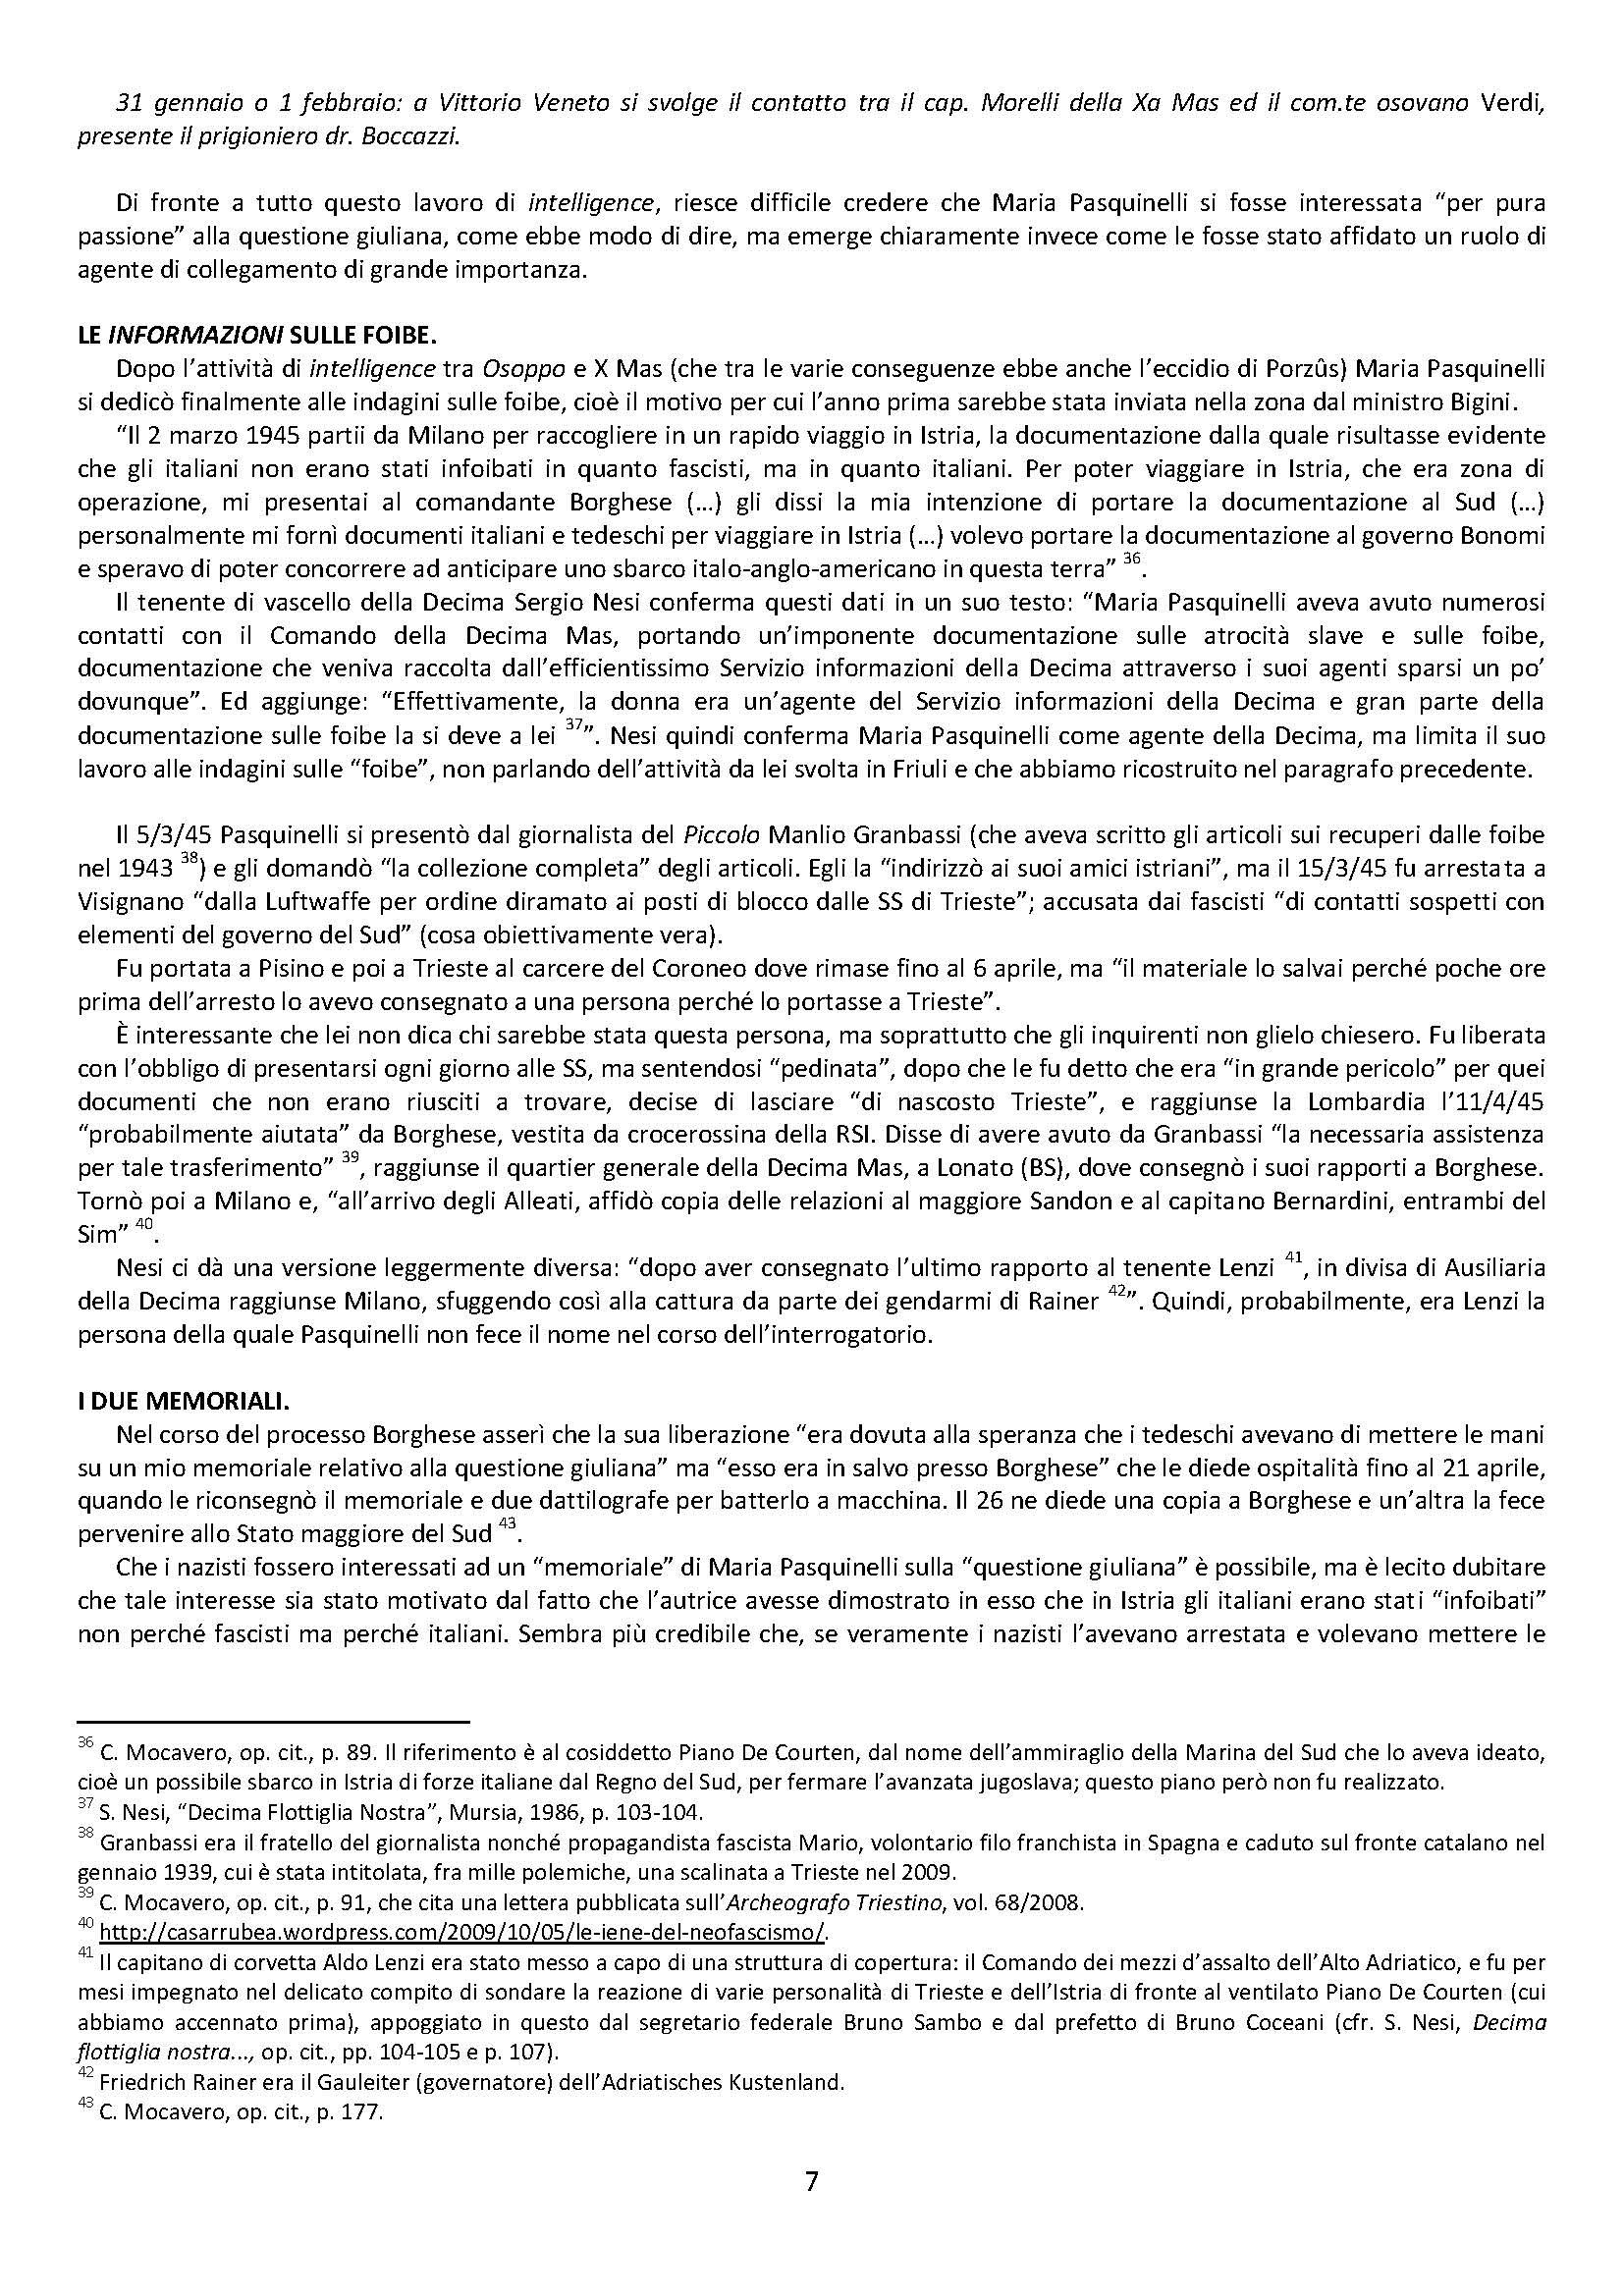 dossier-maria-pasquinelli_Page_07